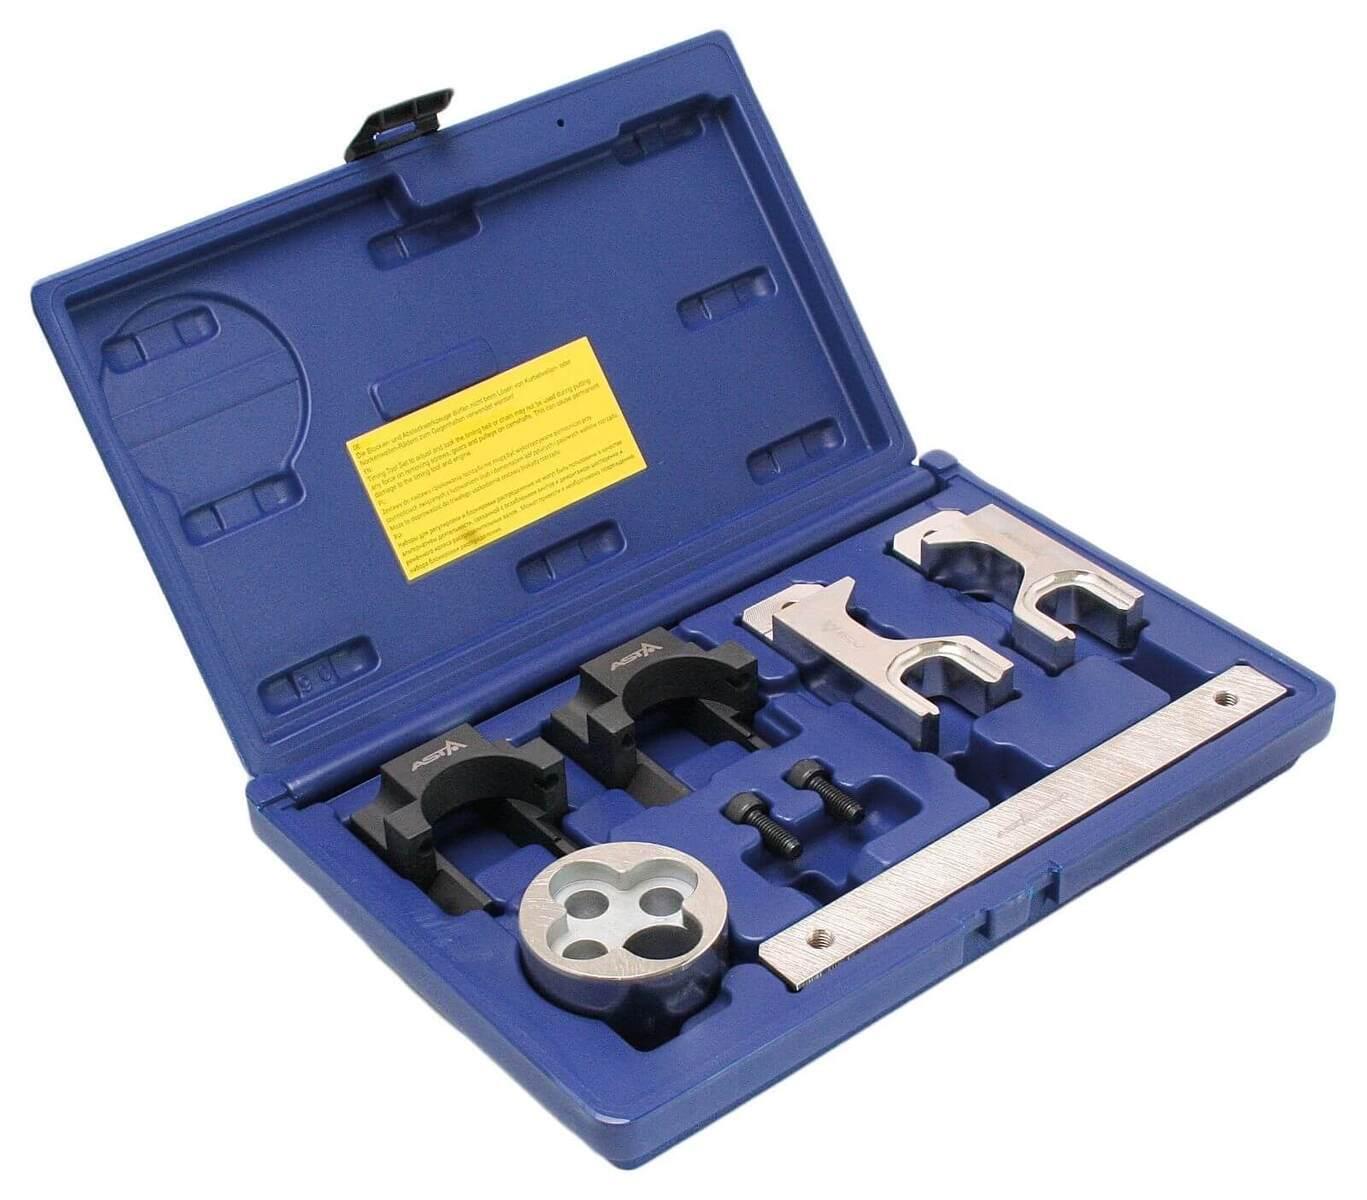 Aretace rozvodů MERCEDES-BENZ OM651 CDI diesel - ASTA A-M651UPG